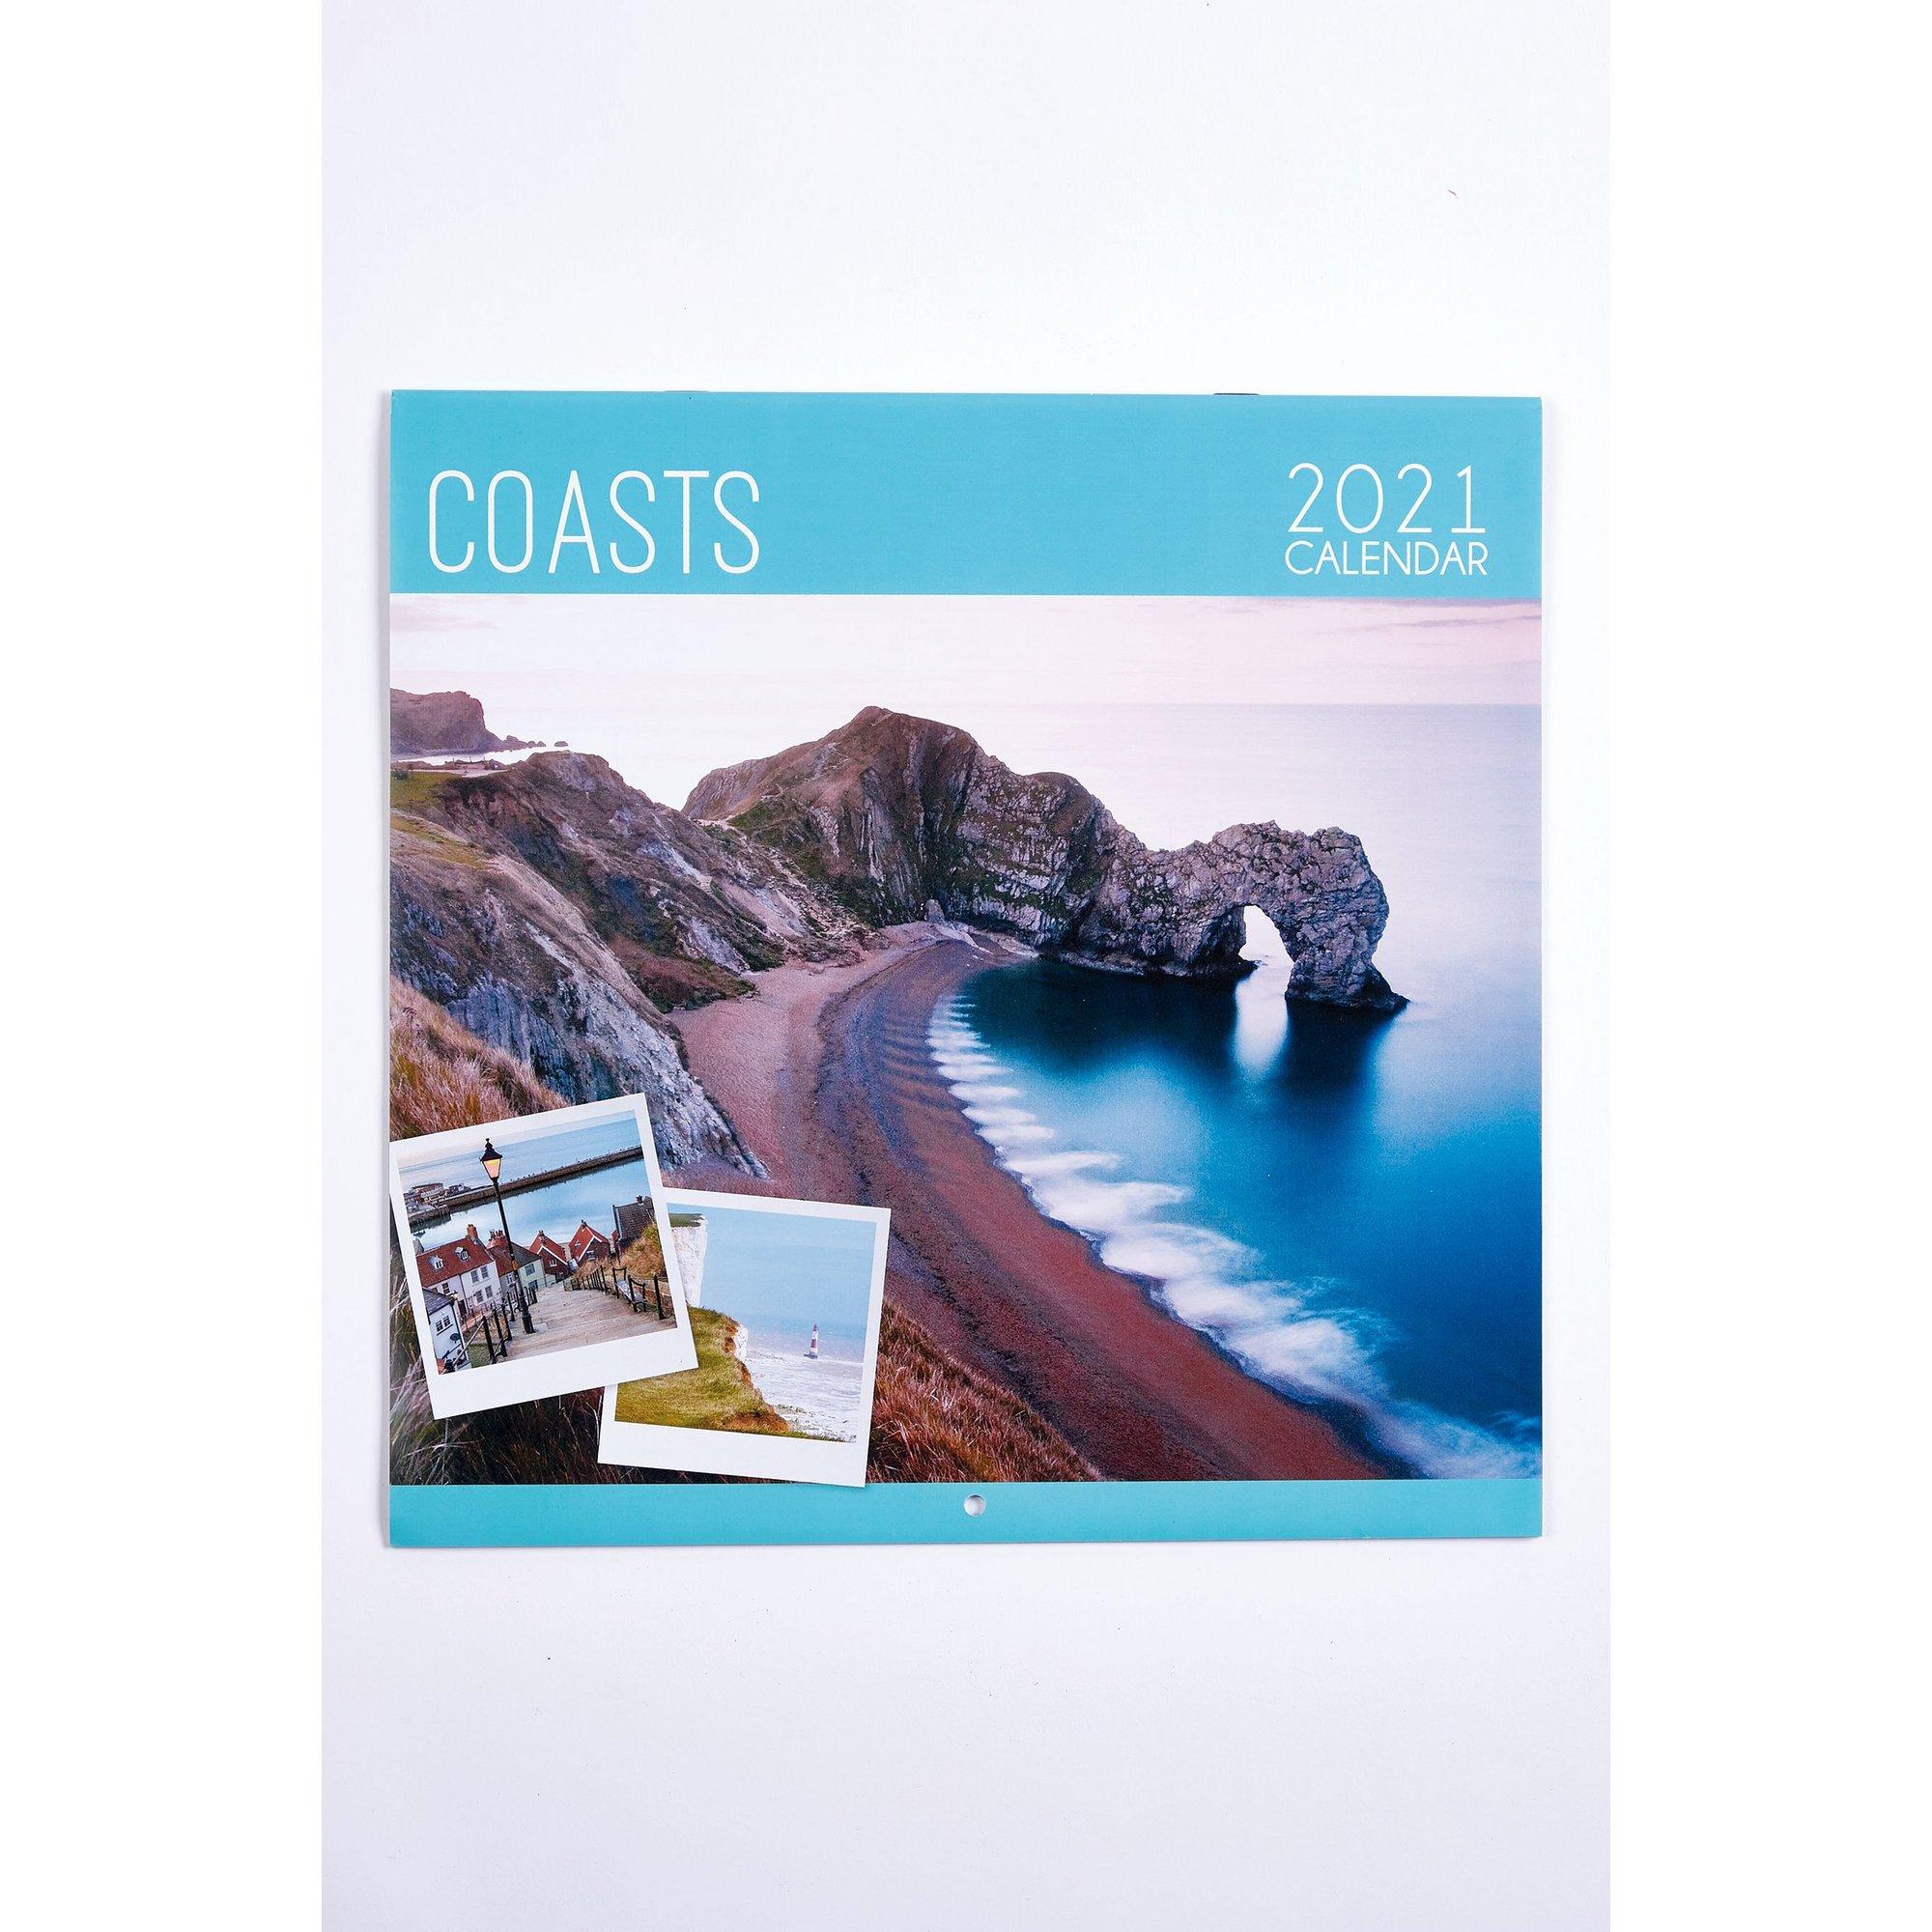 Image of Coasts Calendar 2021